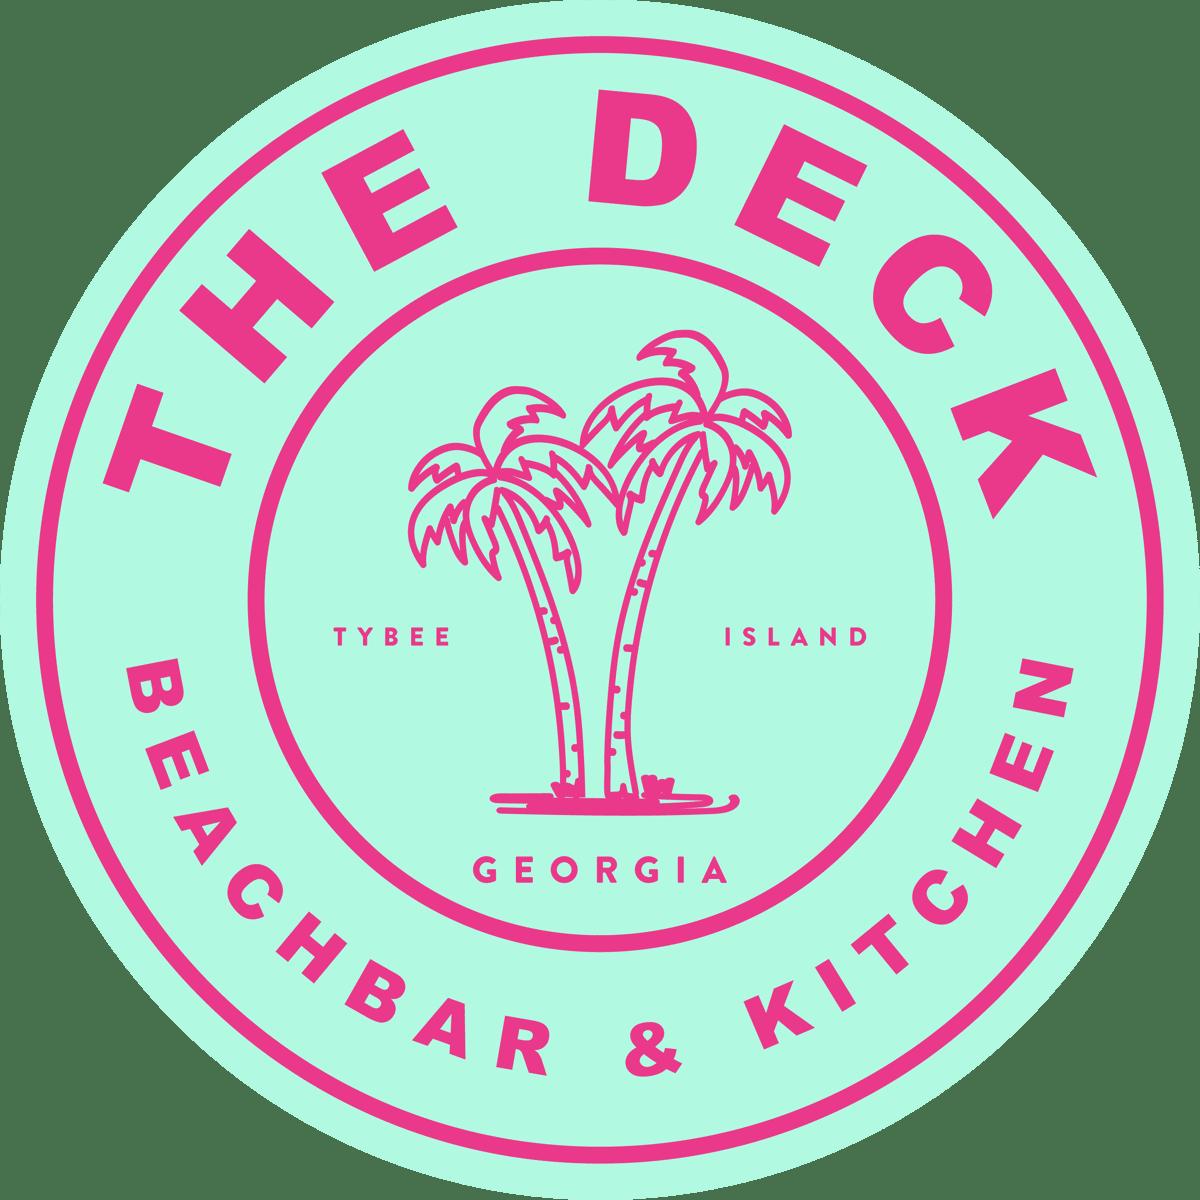 The Deck Beach bar and Kitchen